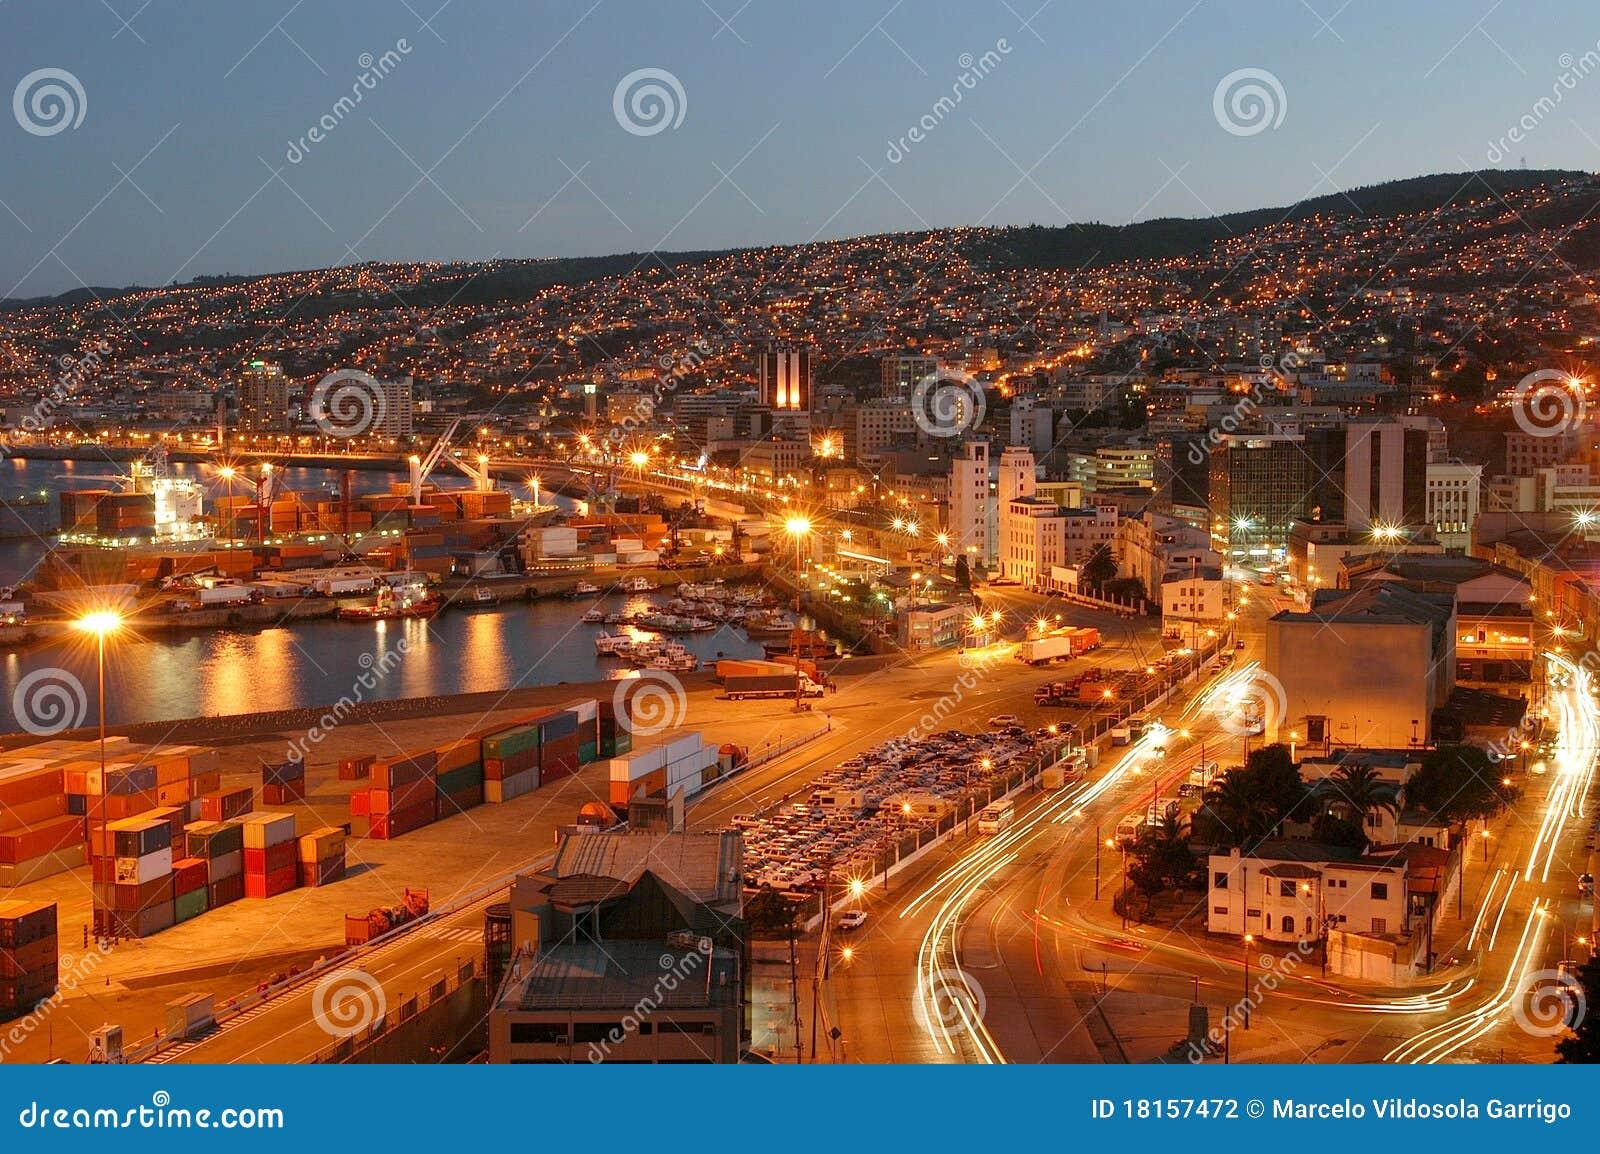 Ciudad Nocturnavalparaiso Stock Photo Image Of Cars 18157472